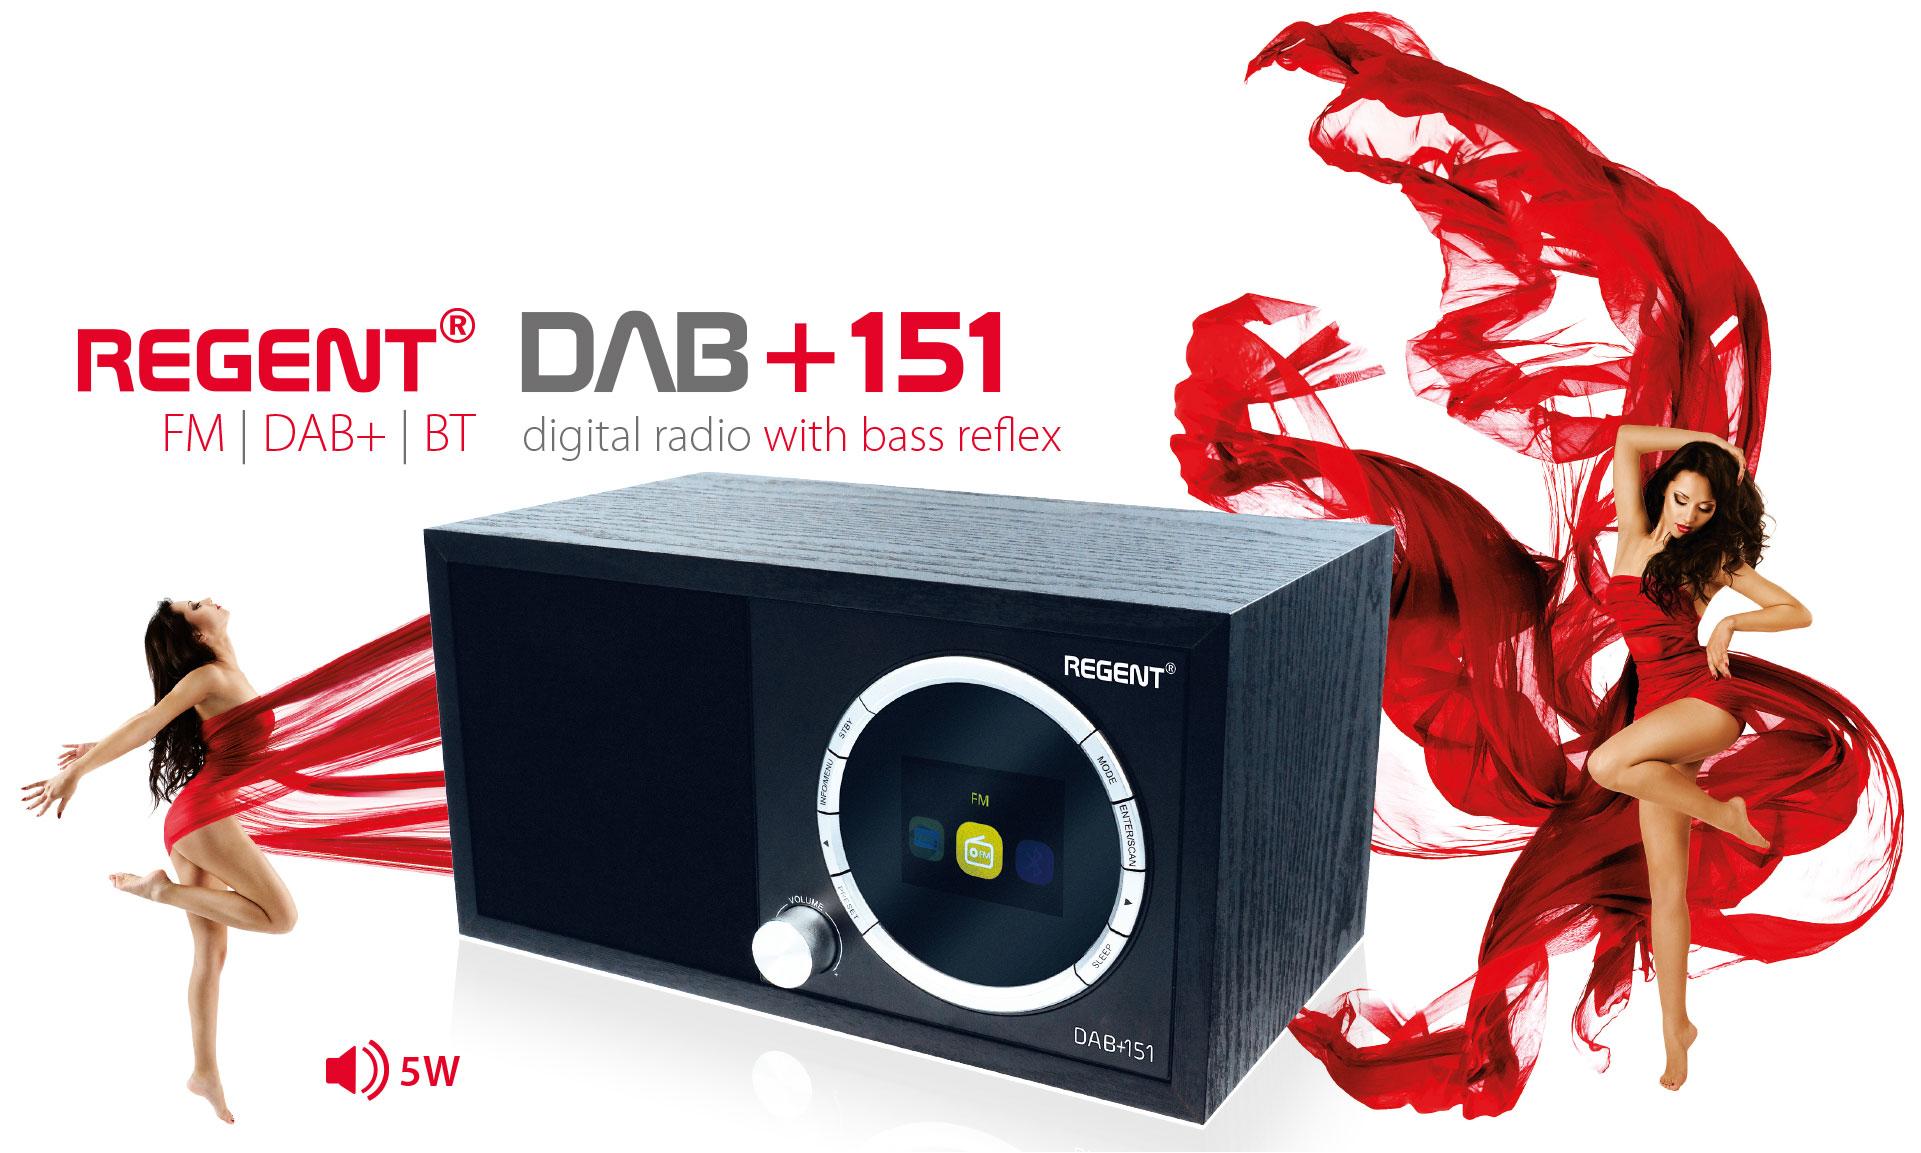 Regent DAB+151